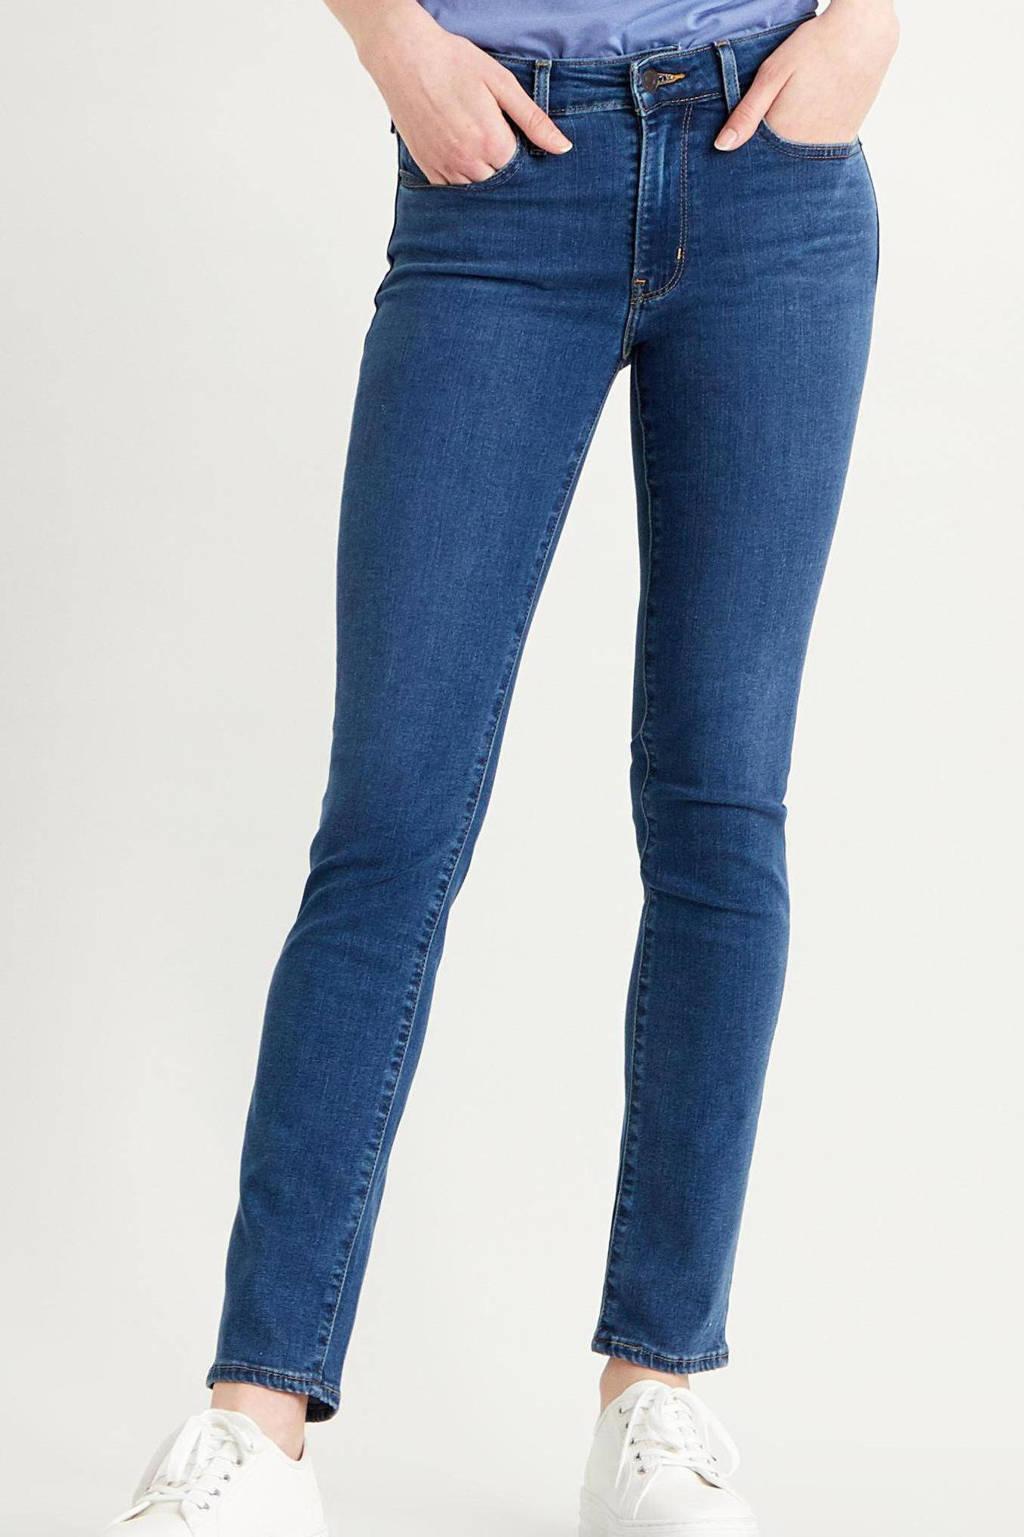 Levi's 712 slim fit jeans bogota heat, BOGOTA HEAT